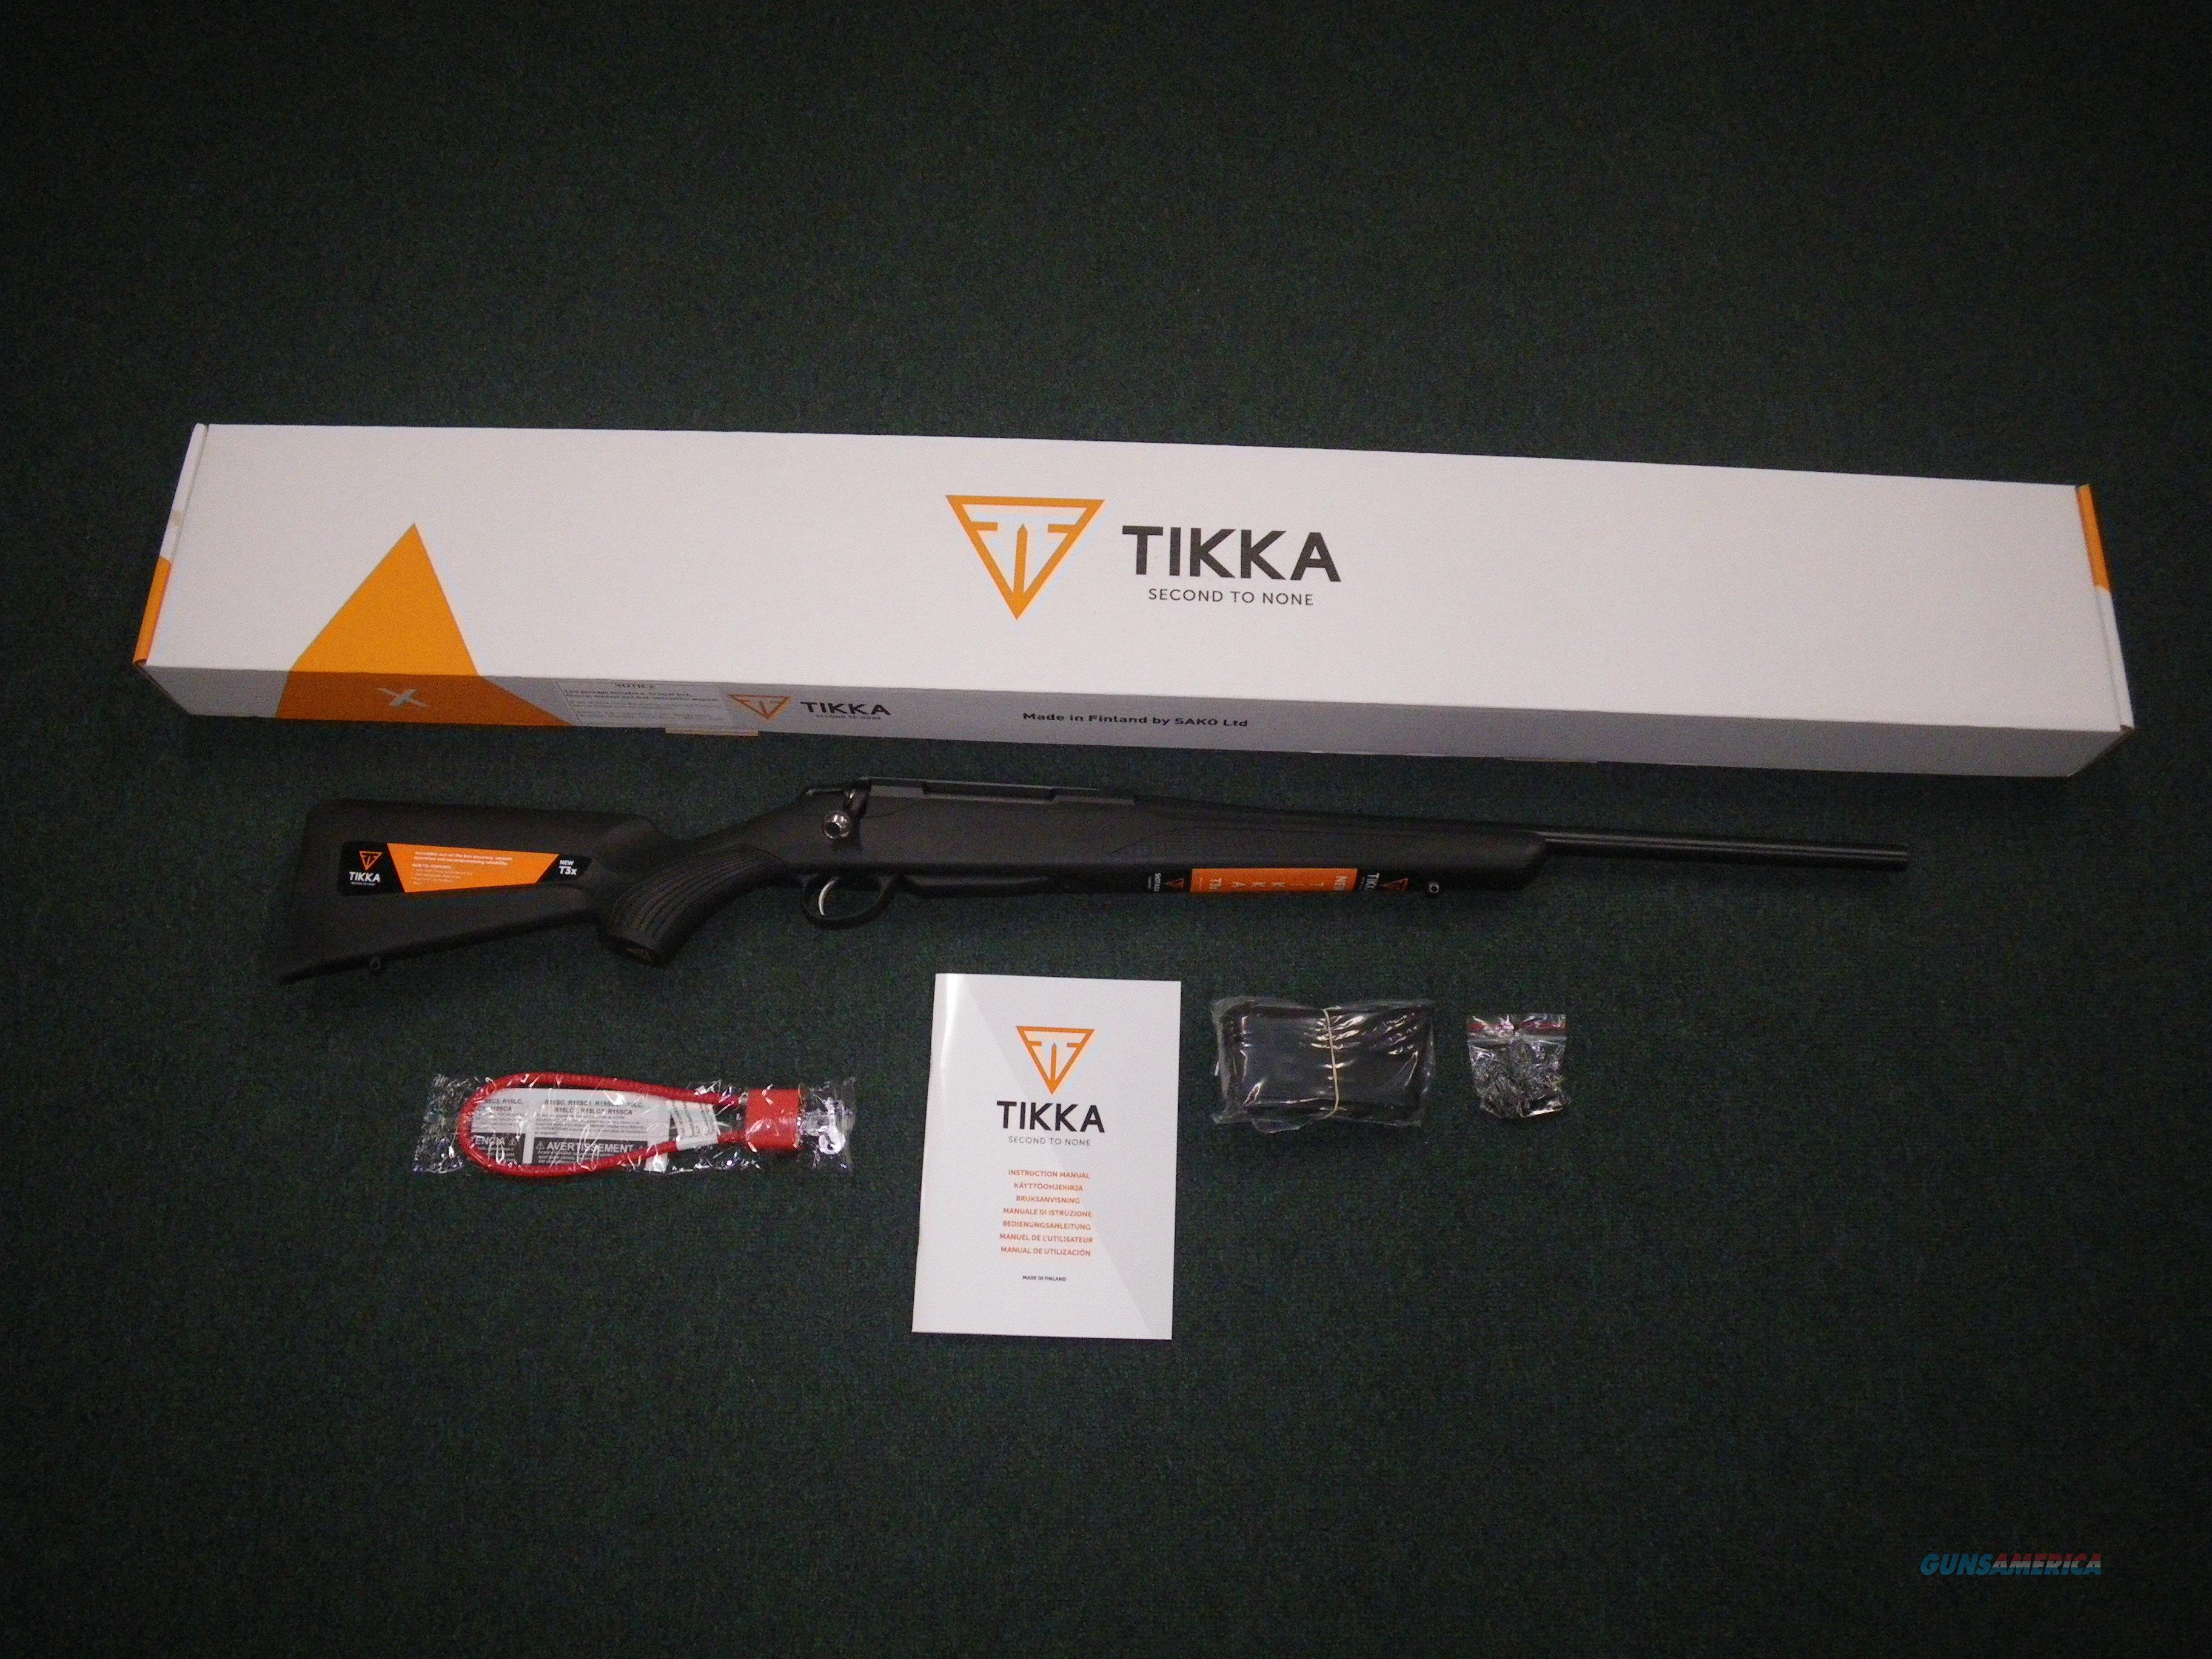 "Tikka T3x Lite Synthetic Blued 30-06 Spfld 22.4"" NEW JRTXE320  Guns > Rifles > Tikka Rifles > T3"